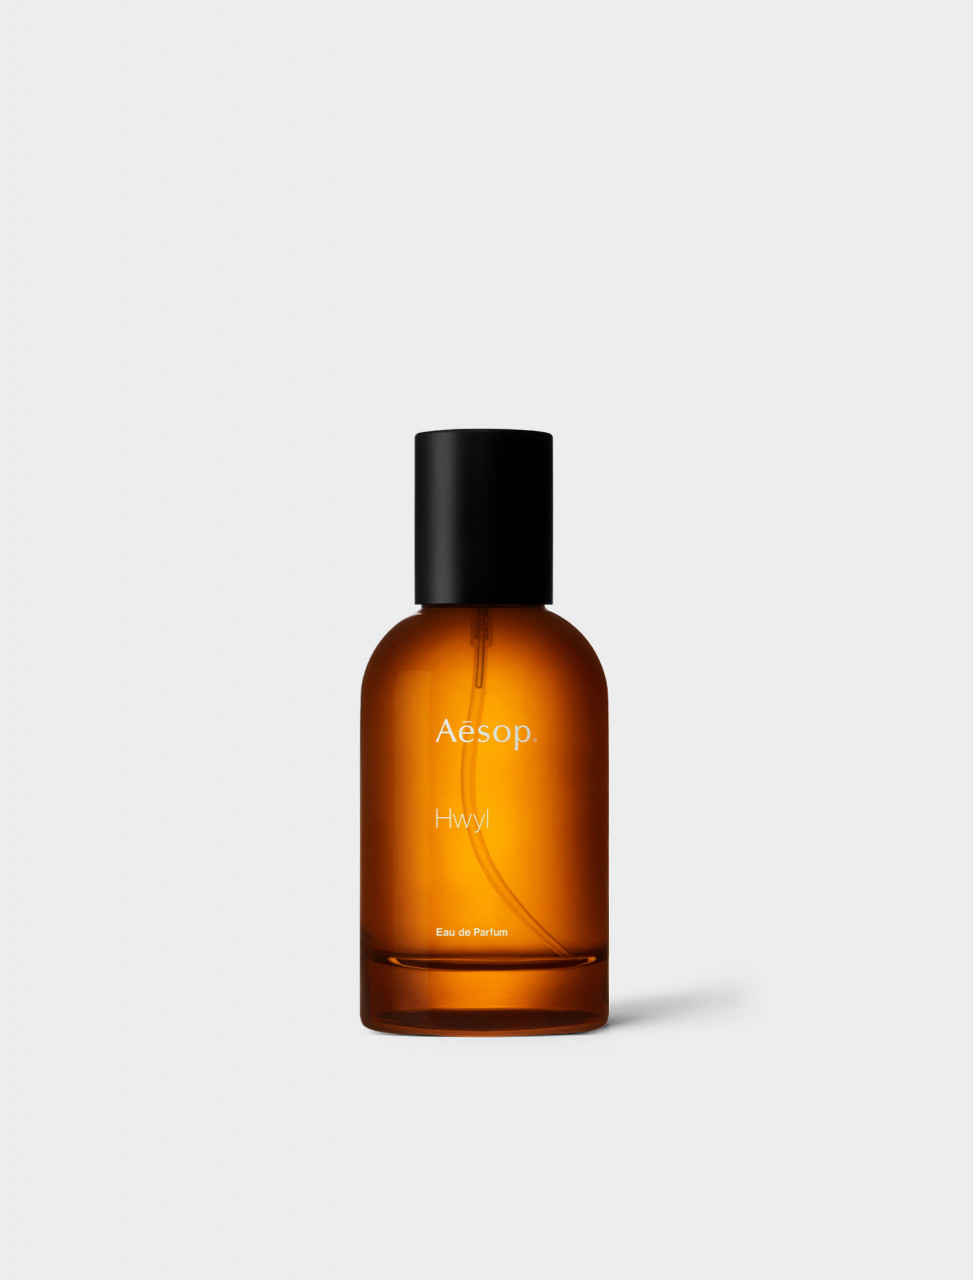 Hwyl Eau de Parfum 50 mL